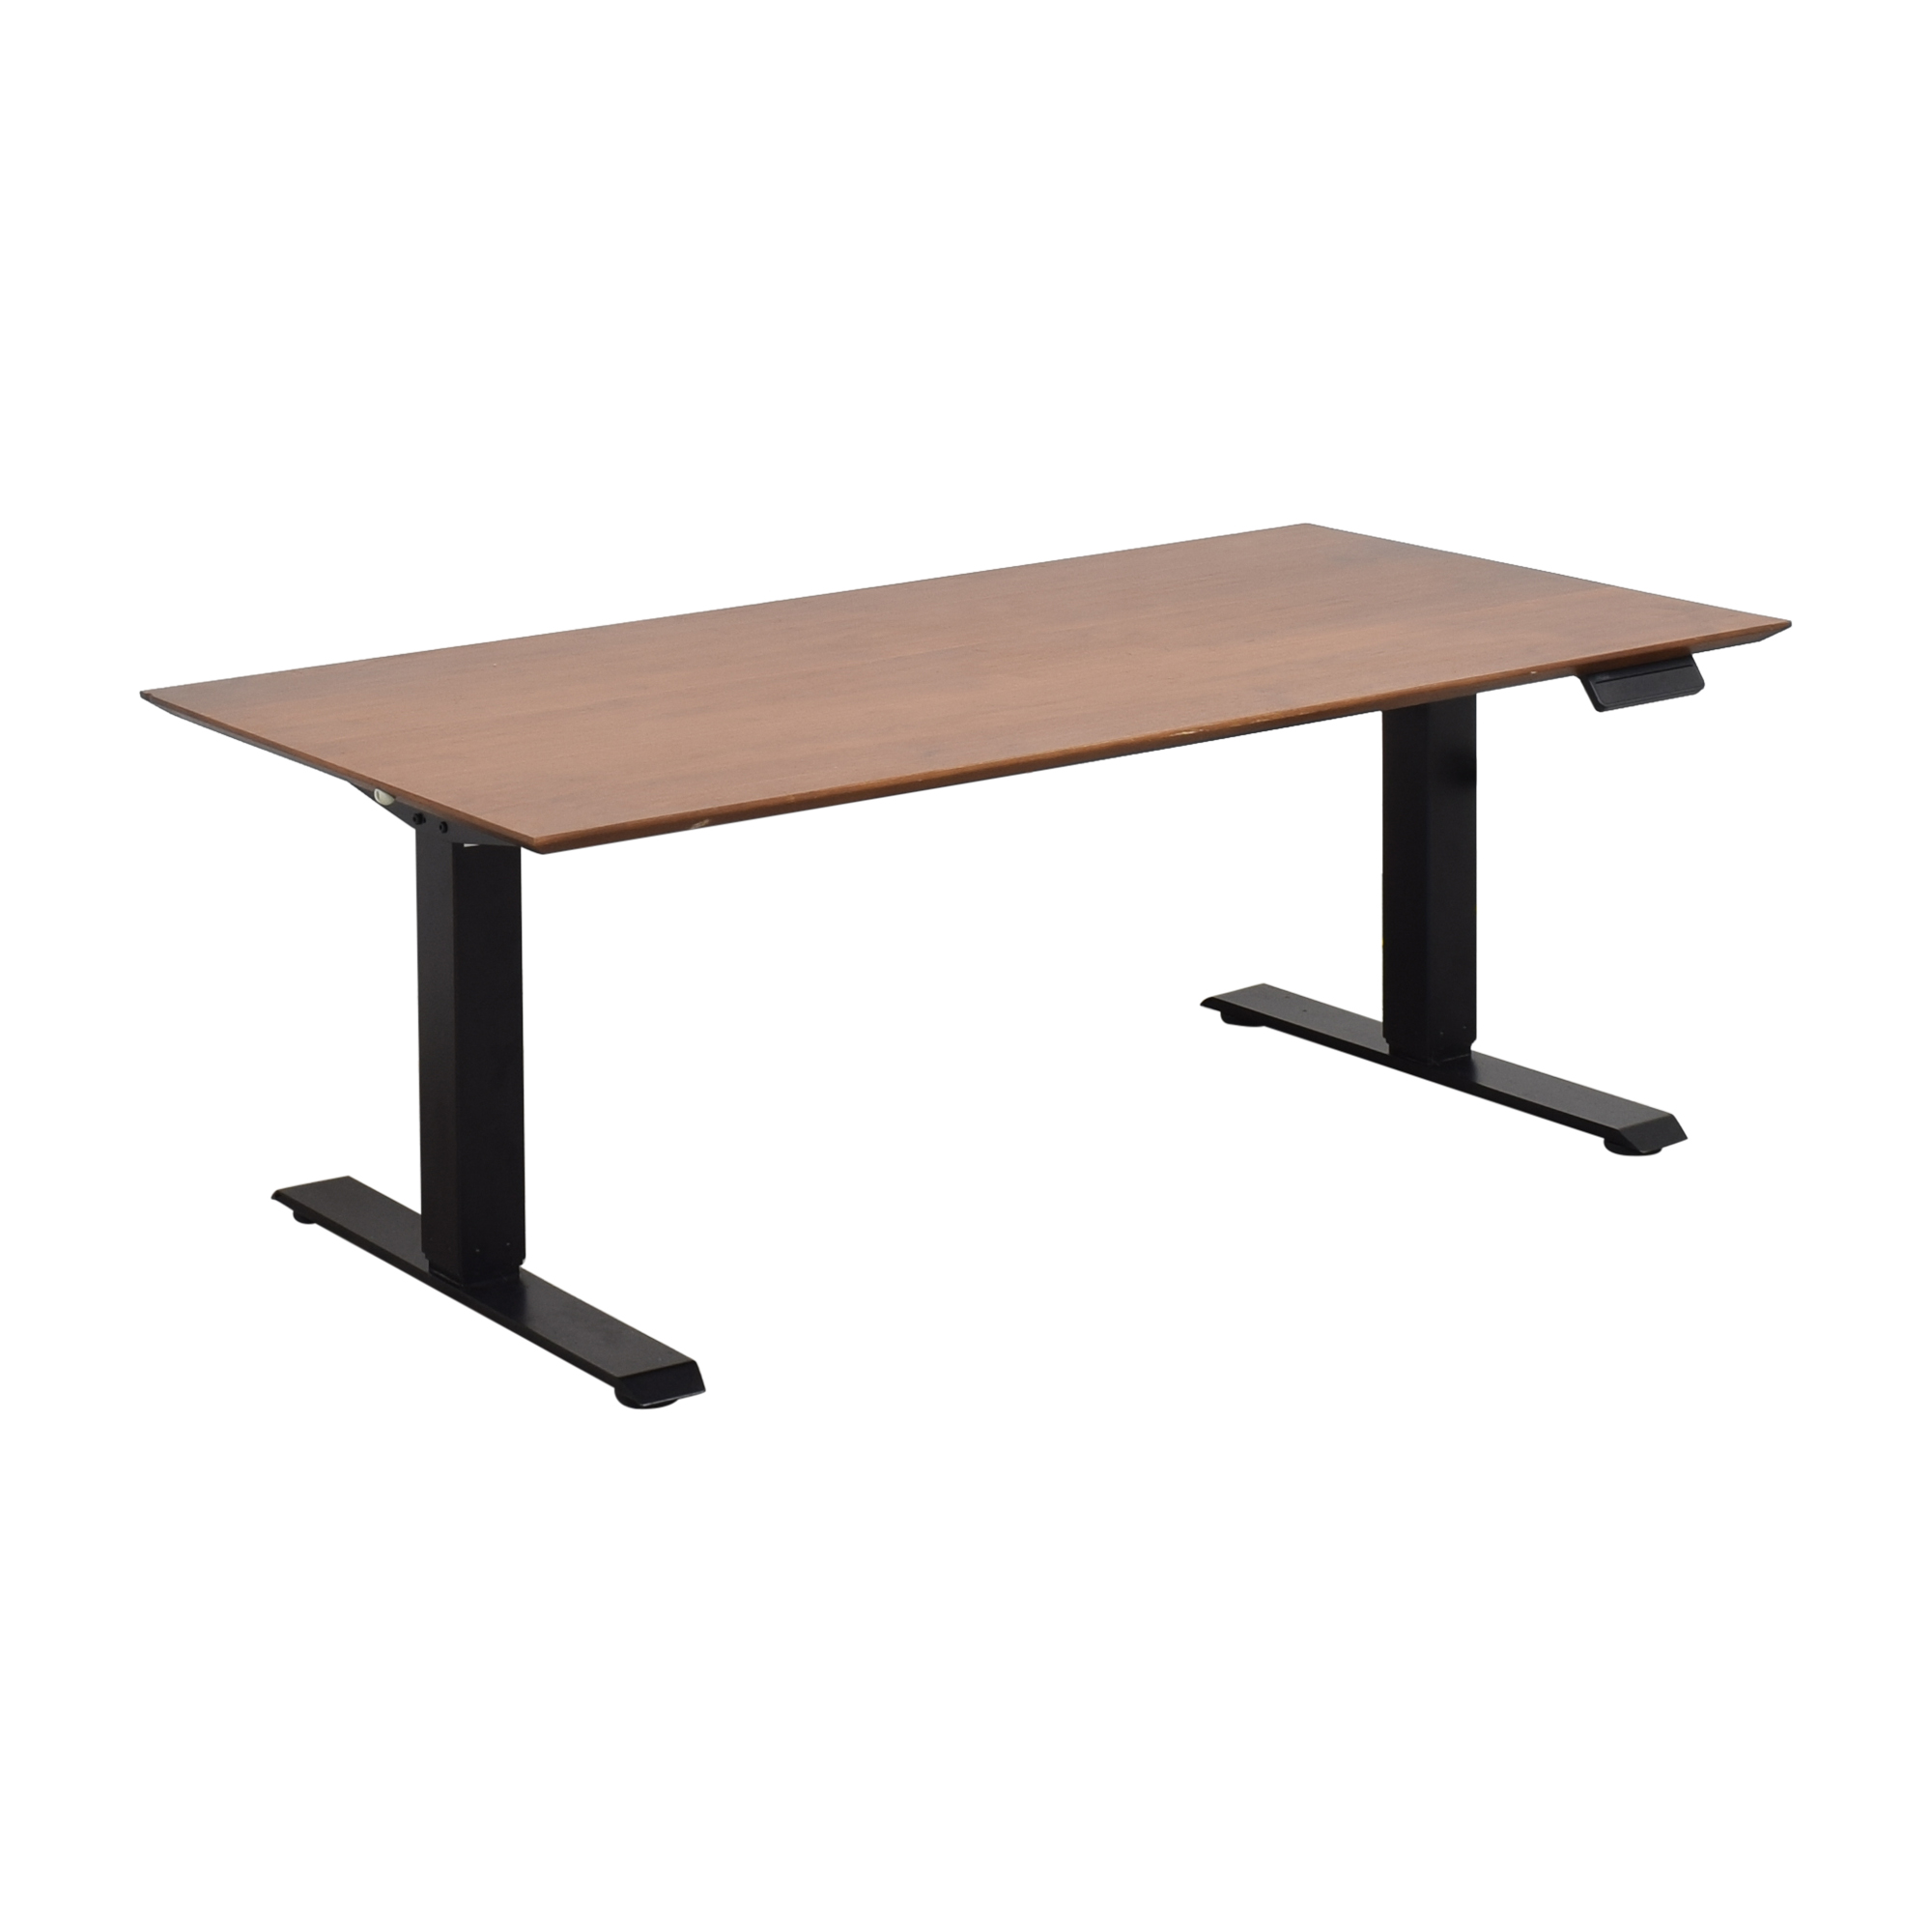 buy West Elm West Elm Mid Century Sit + Stand Adjustable Desk online